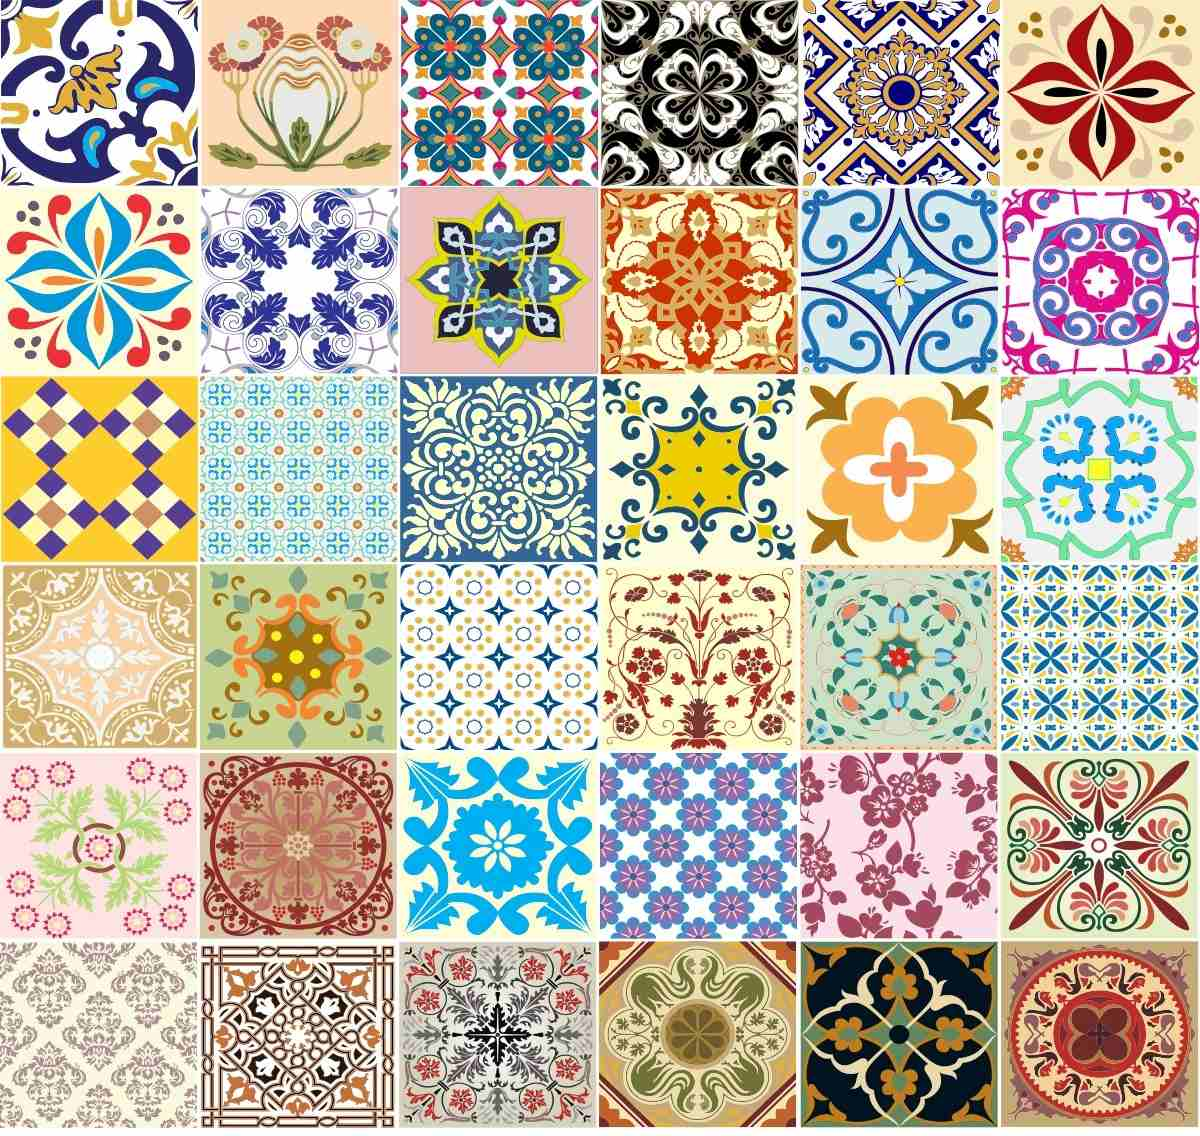 Adesivo azulejos decorativos 36 unidades frete gr tis r 69 89 no mercadolivre - Calcular valor tasacion piso ...